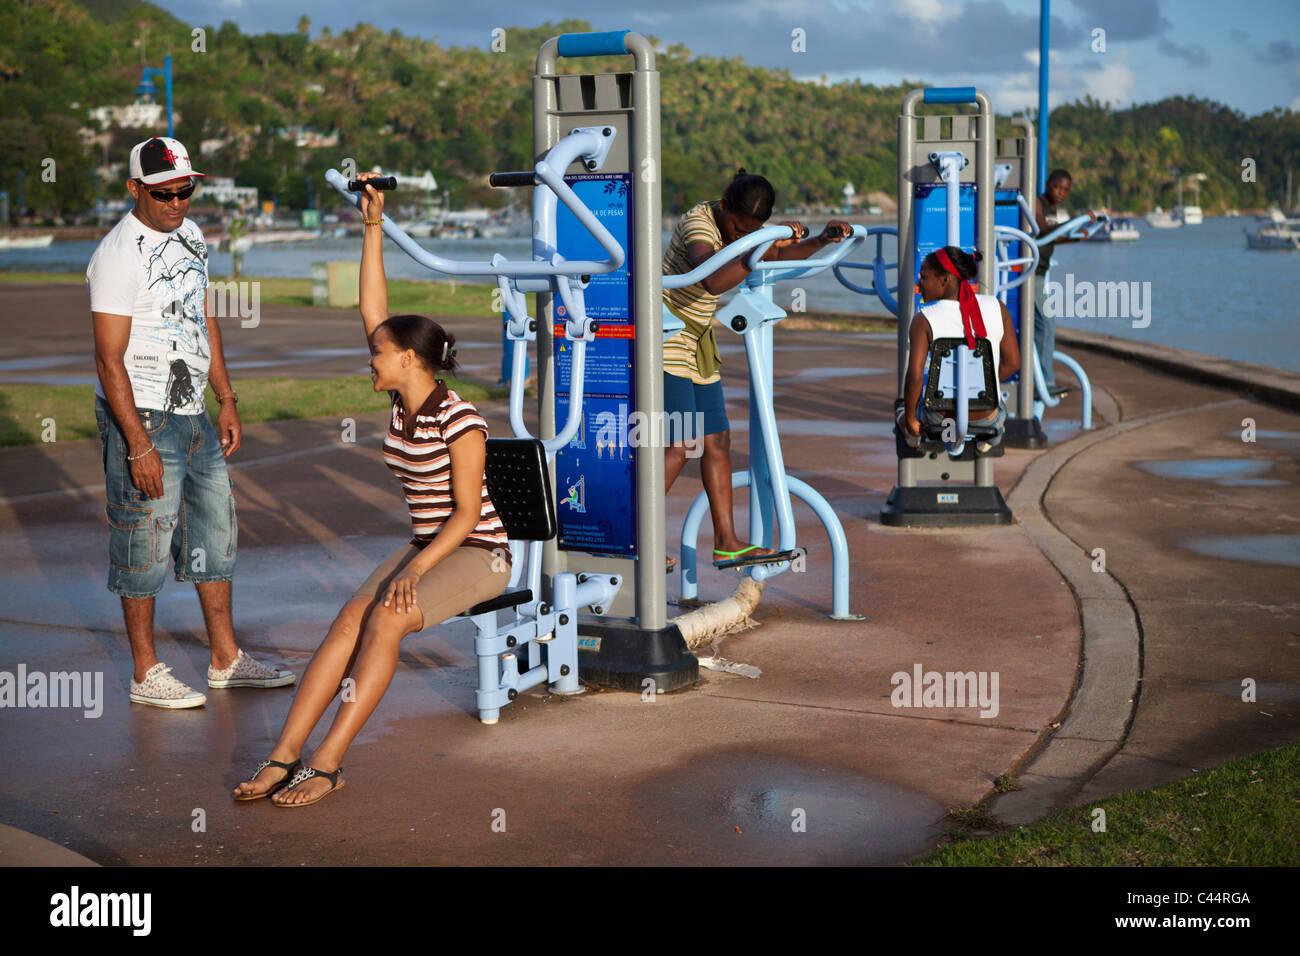 Work out at Promenade of Samana, Samana Peninsula, Dominican Republic - Stock Image